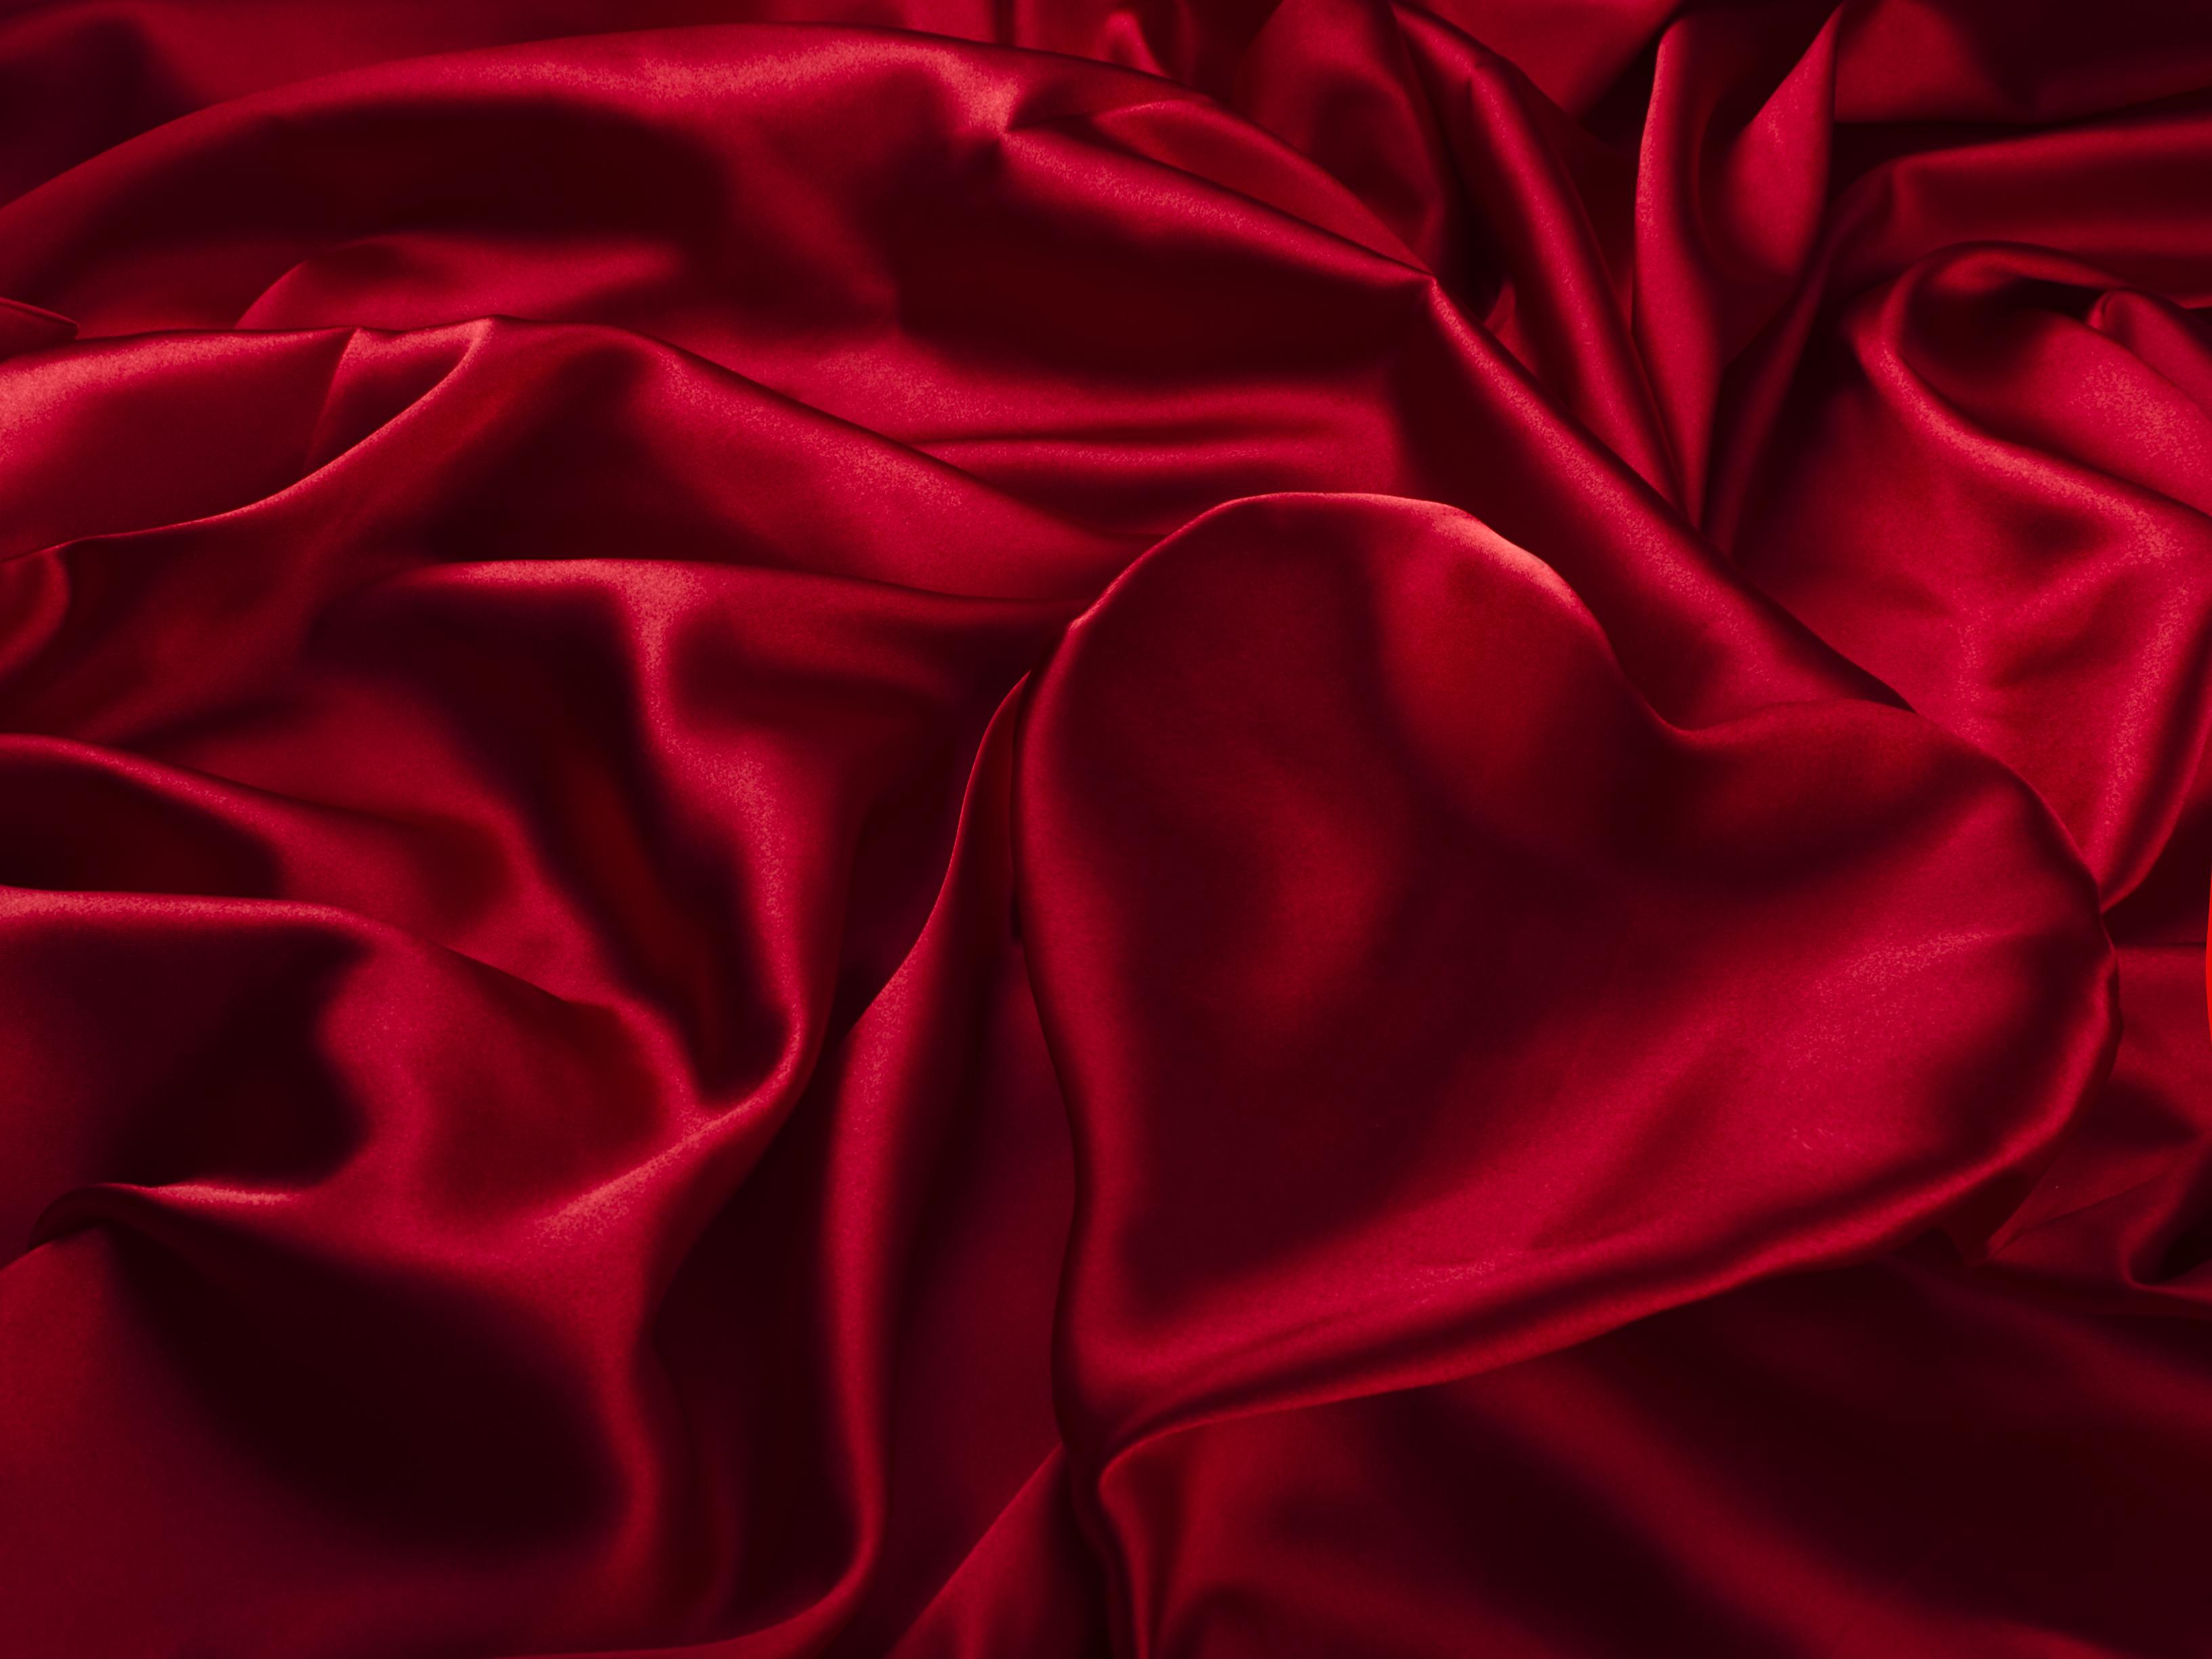 55+ Red Satin Wallpaper on WallpaperSafari